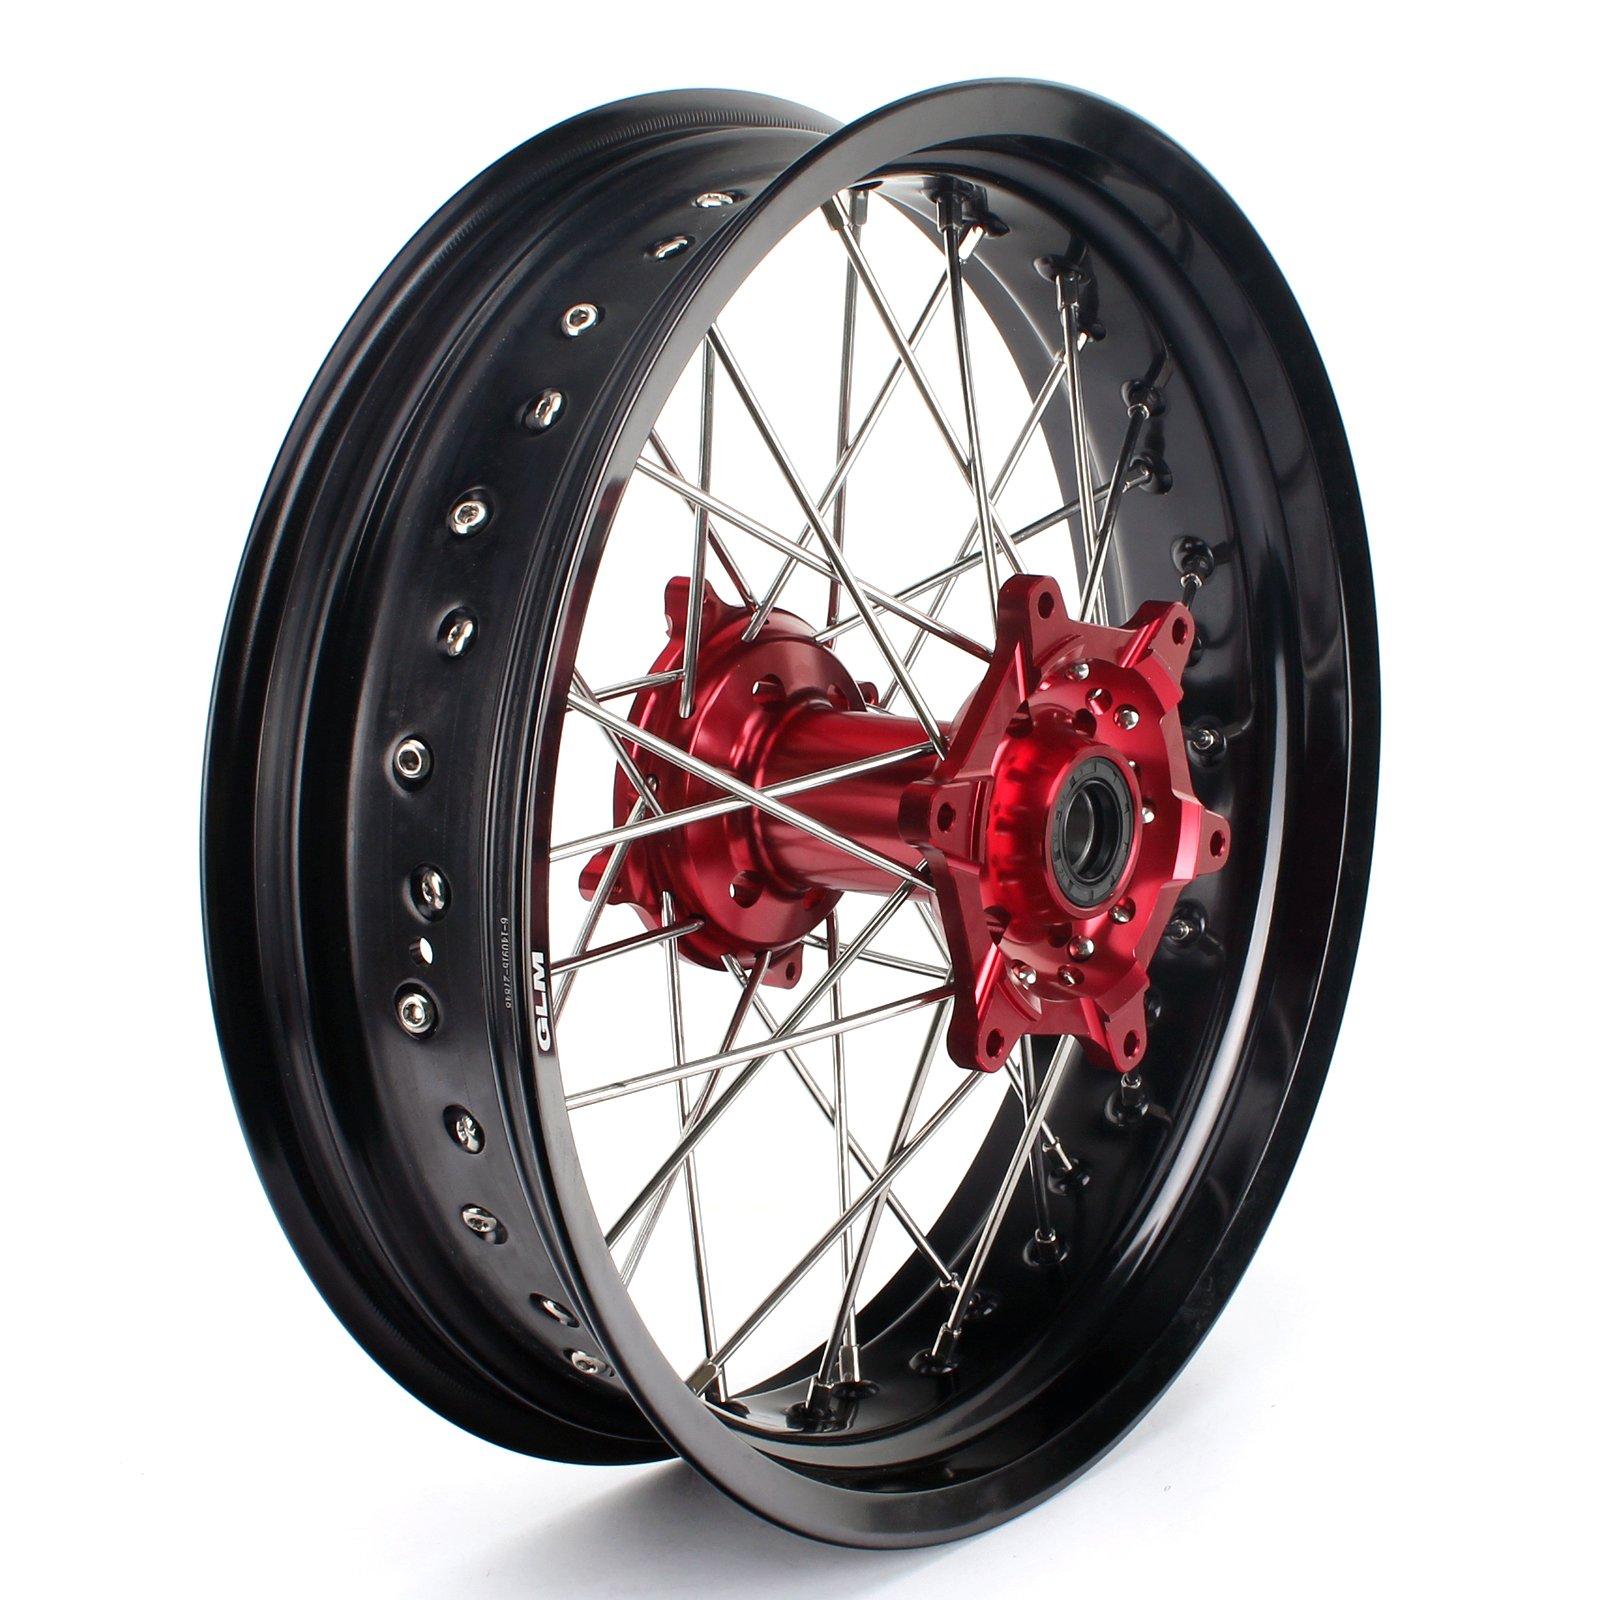 TARAZON 17 Supermoto Supermotard Rear Complete Wheel Kit Red Hub Rim Spokes for Honda CR125R CR250R CRF250R CRF450R 2004-2012 CRF450X CRF250X 2004-2016